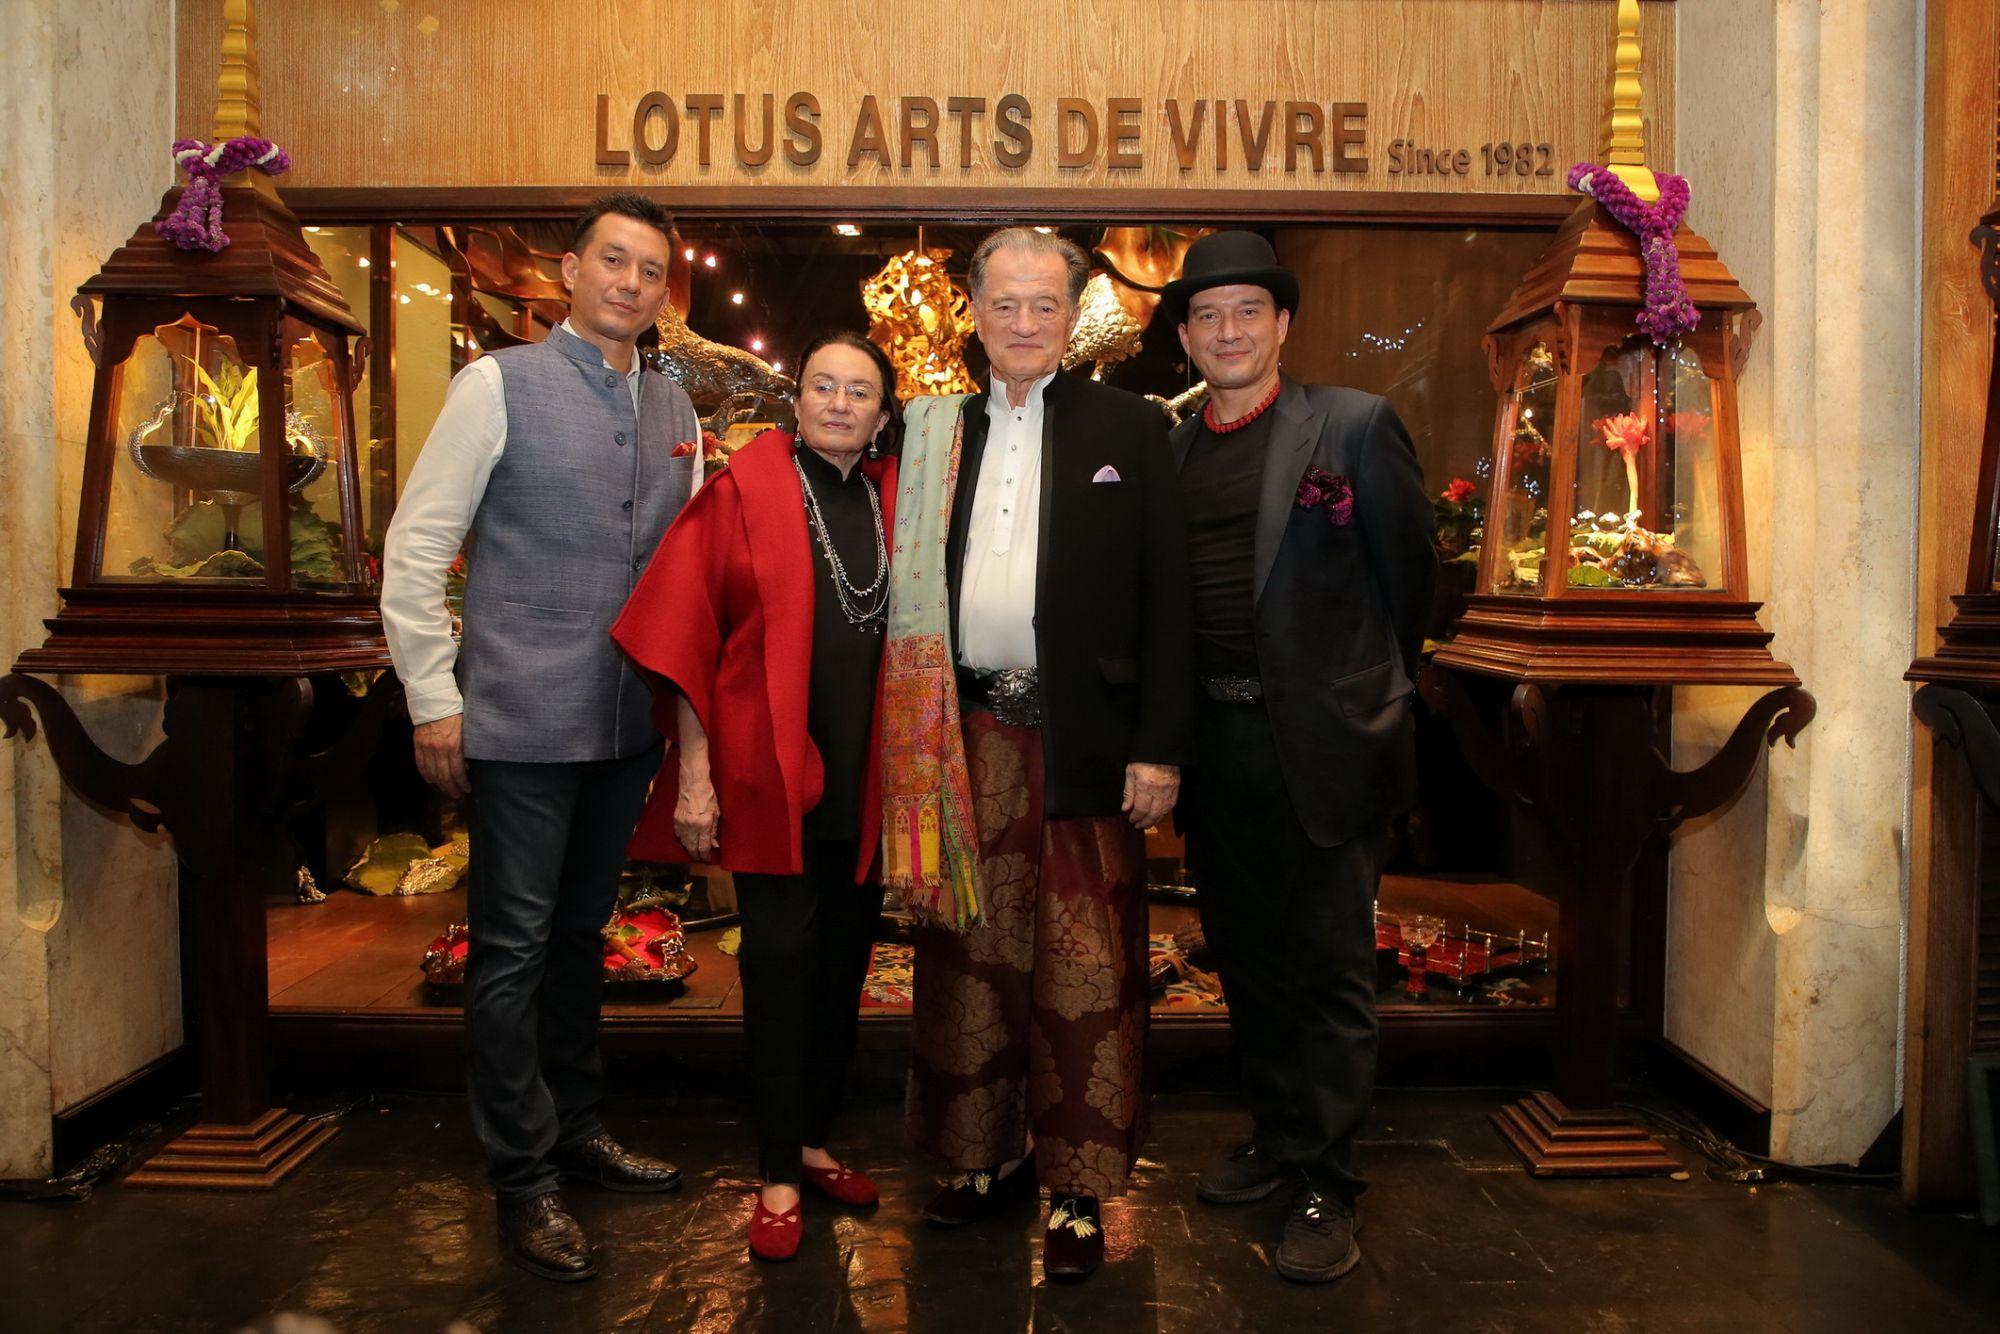 The von Bueren family: Nicki, Helen, Rolf and Sri